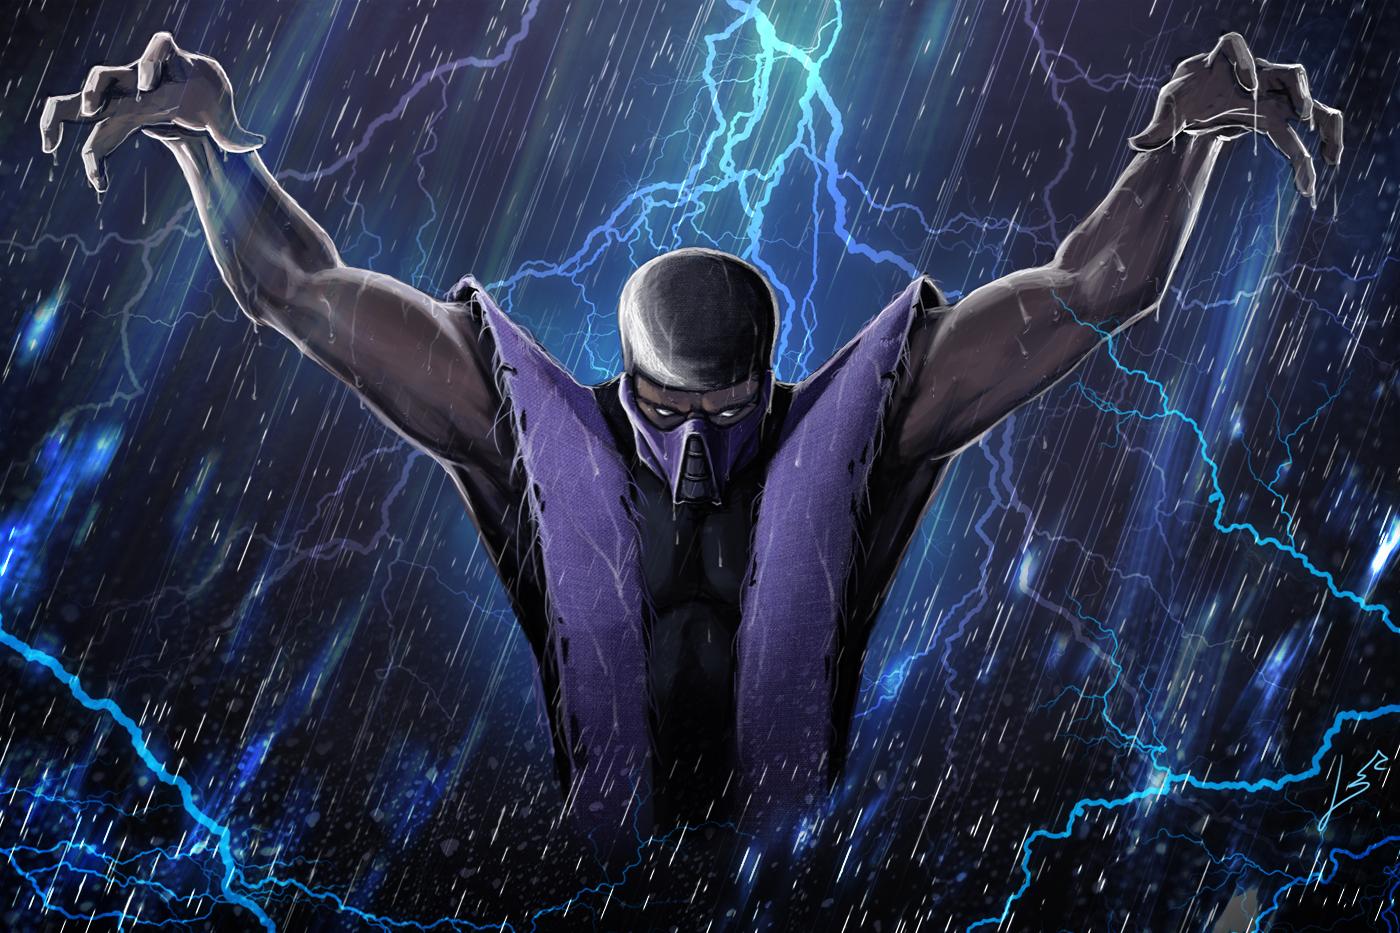 Mortal Kombat X: How to Play as Rain, Baraka, and Other NPC